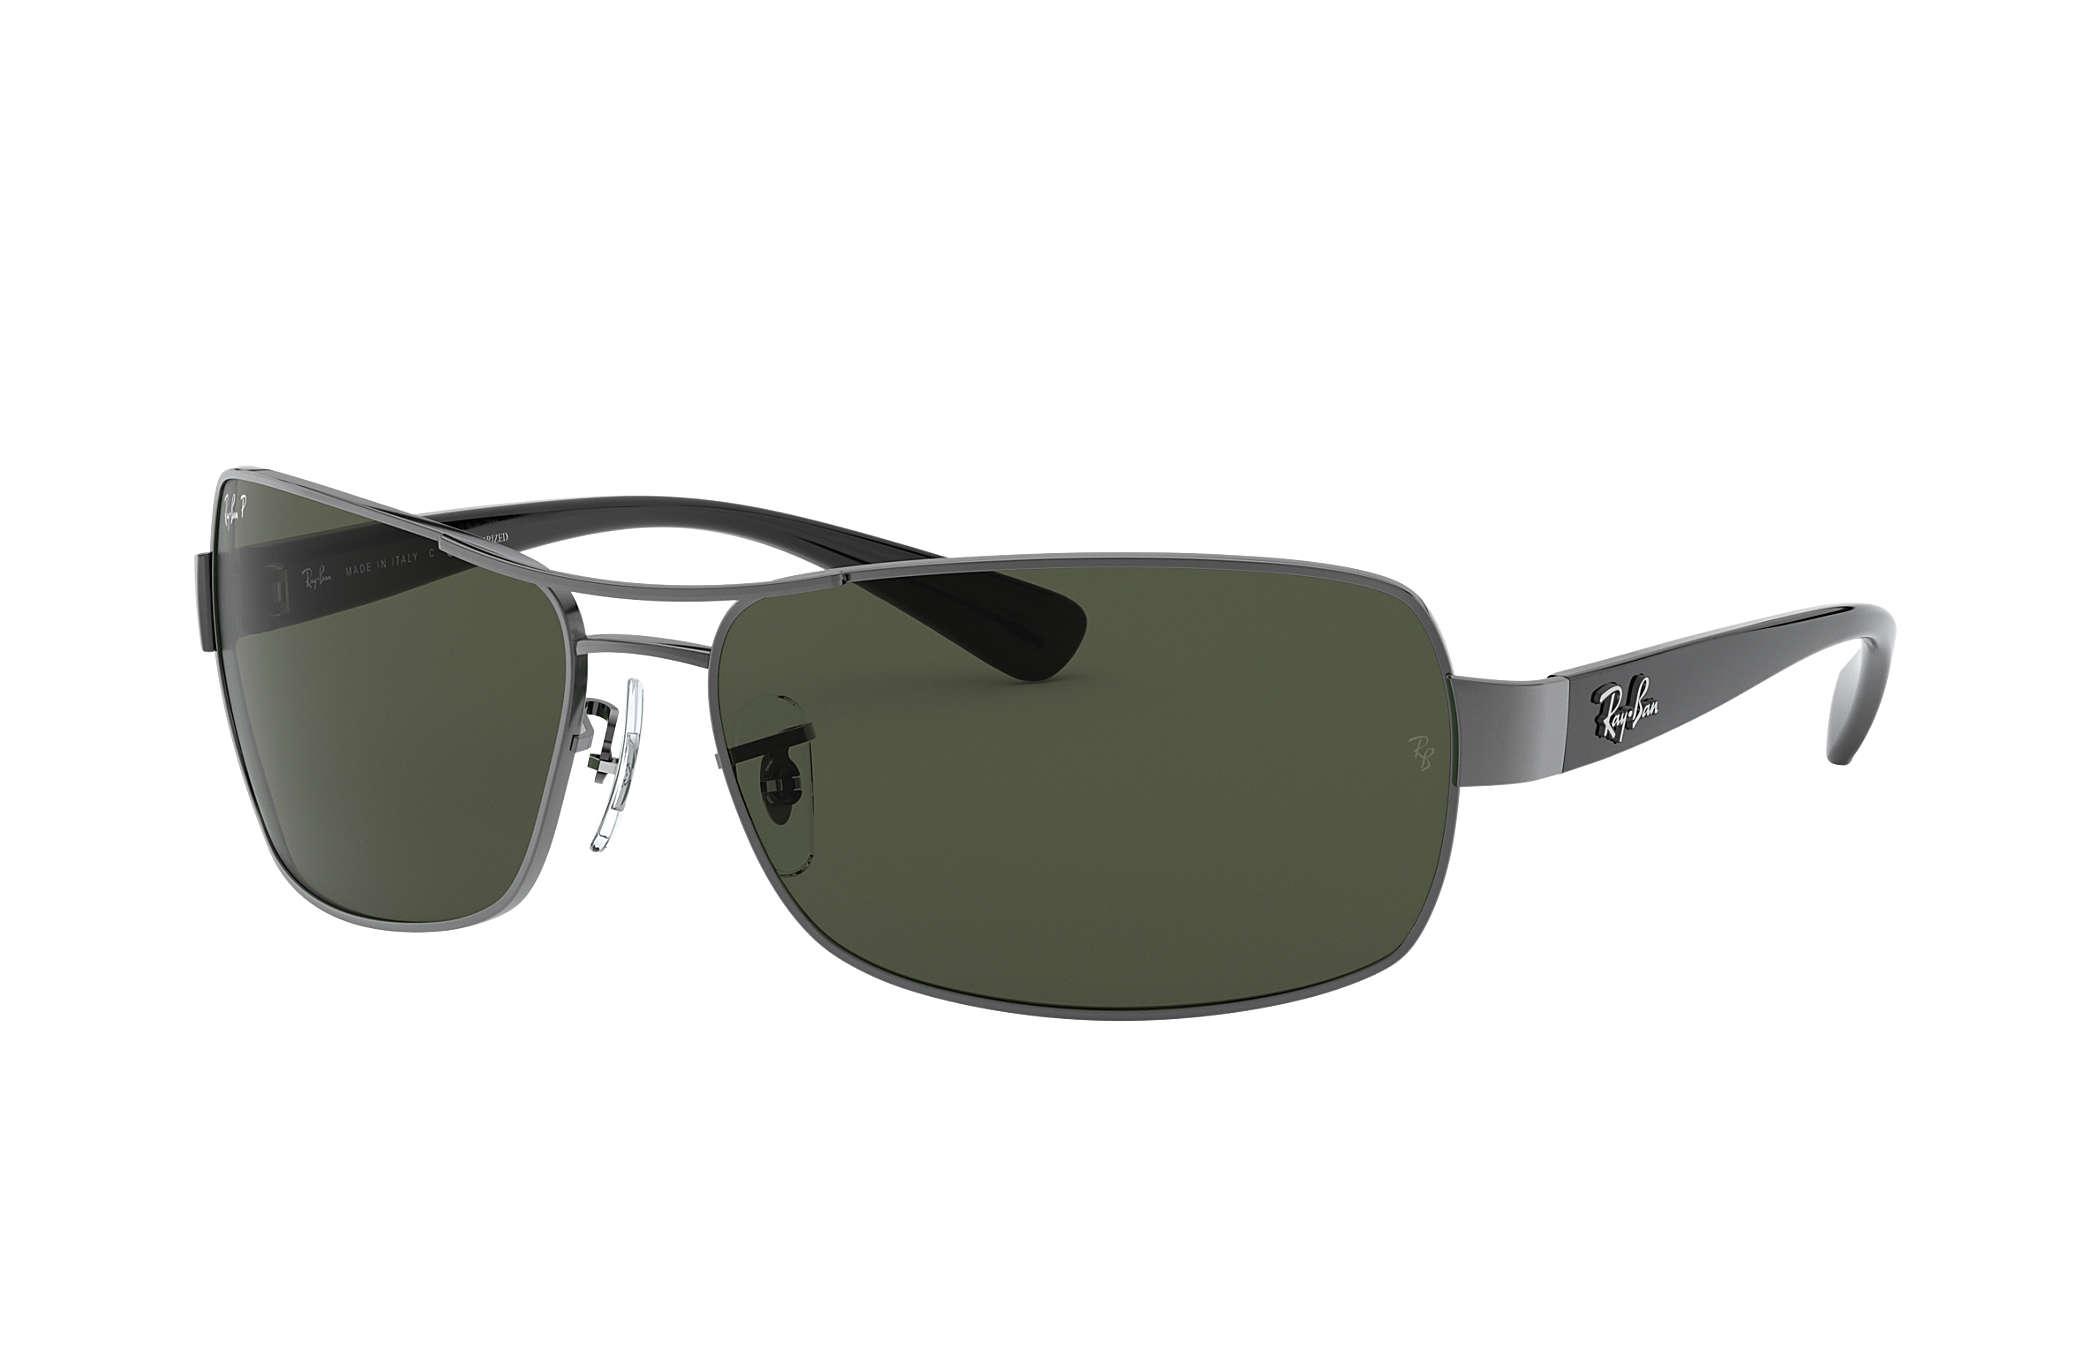 Ray ban sunglasses sale new zealand - Ray Ban 0rb3379 Rb3379 Gunmetal Black Sun